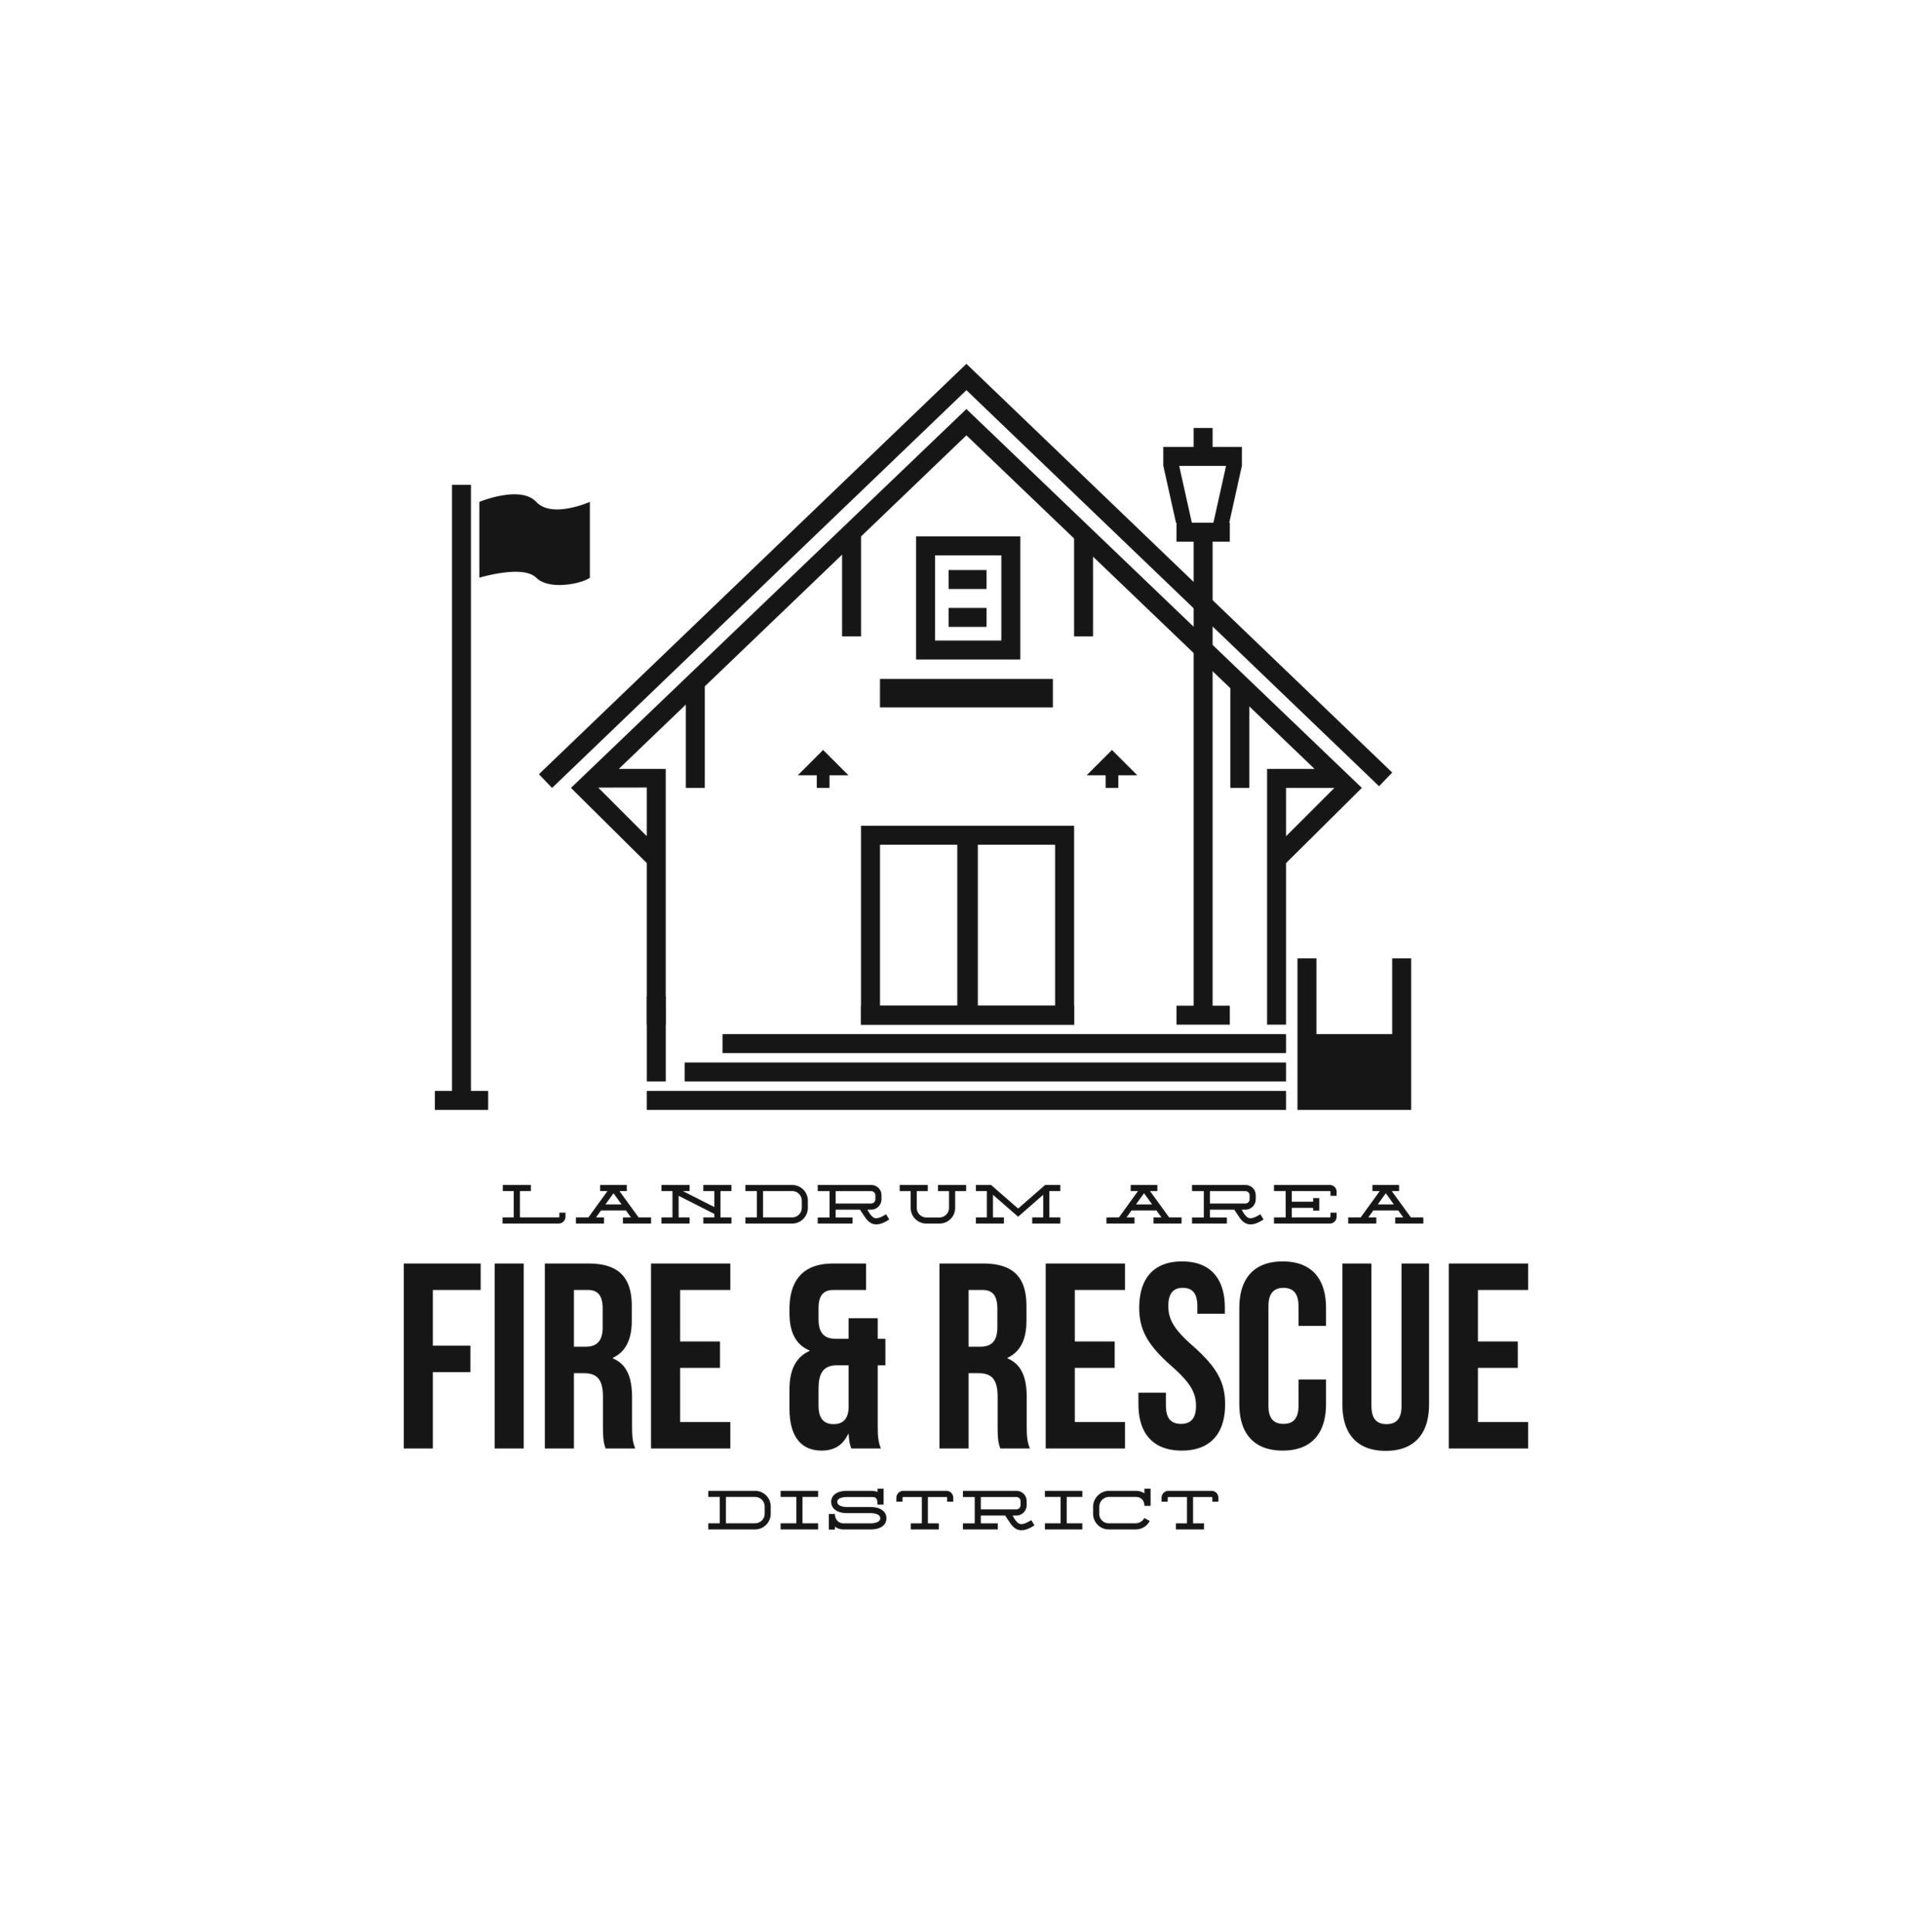 Landrum Area Fire & Rescue District